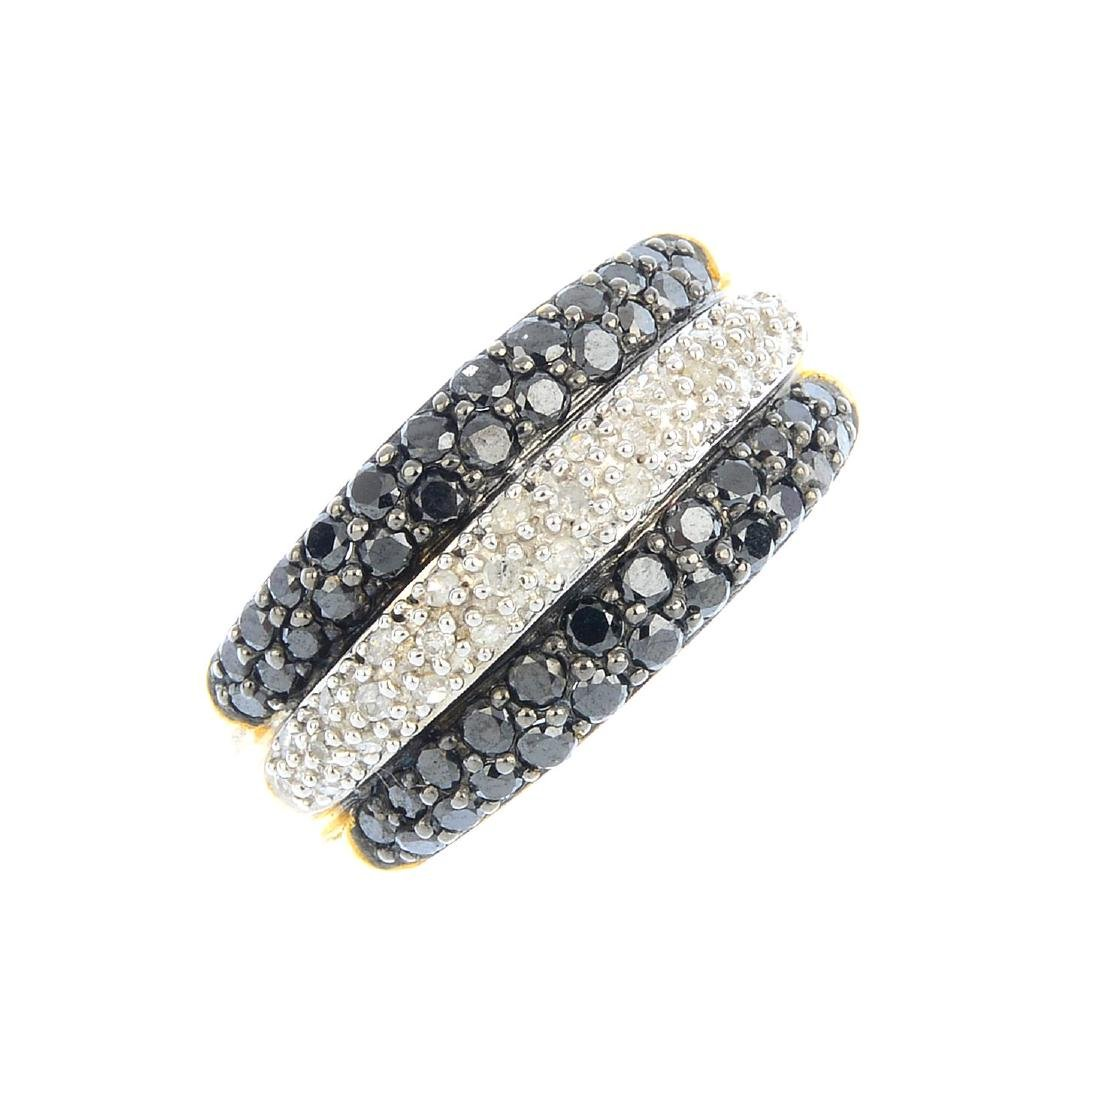 A diamond and black-gem dress ring. Designed as three